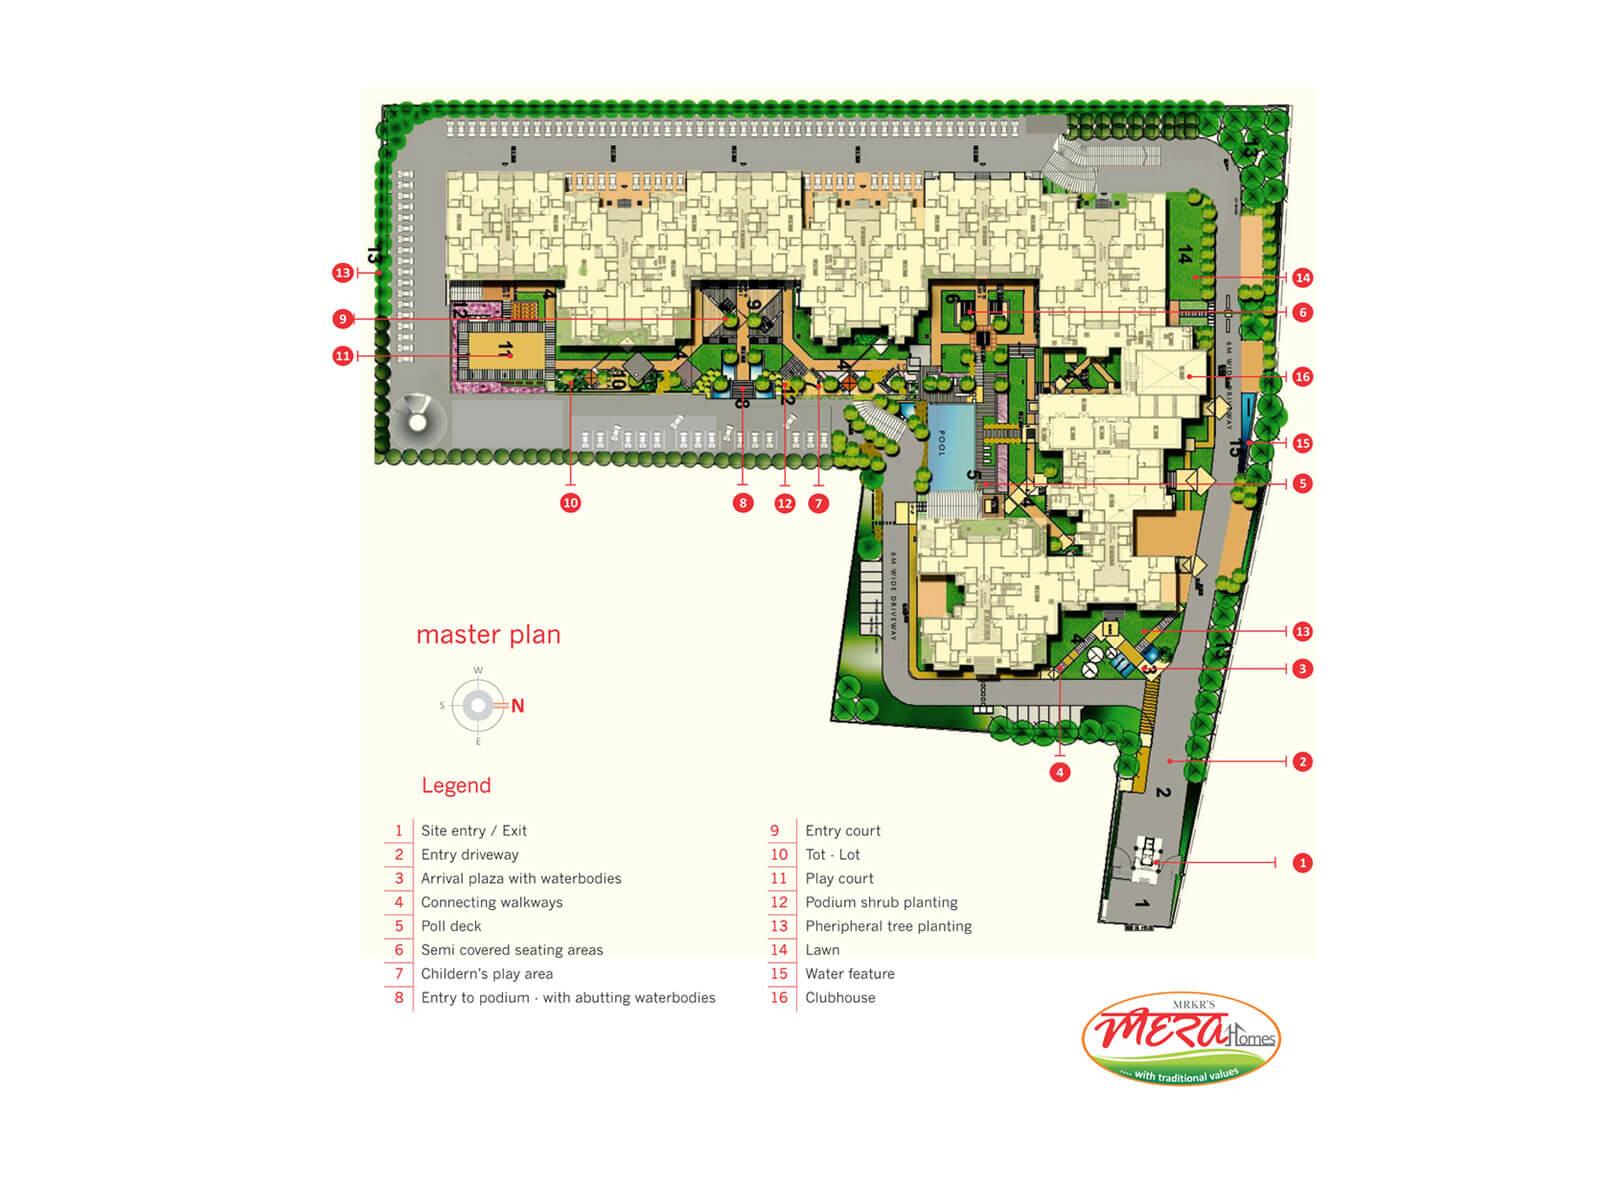 mrkr mera homes master plan image1